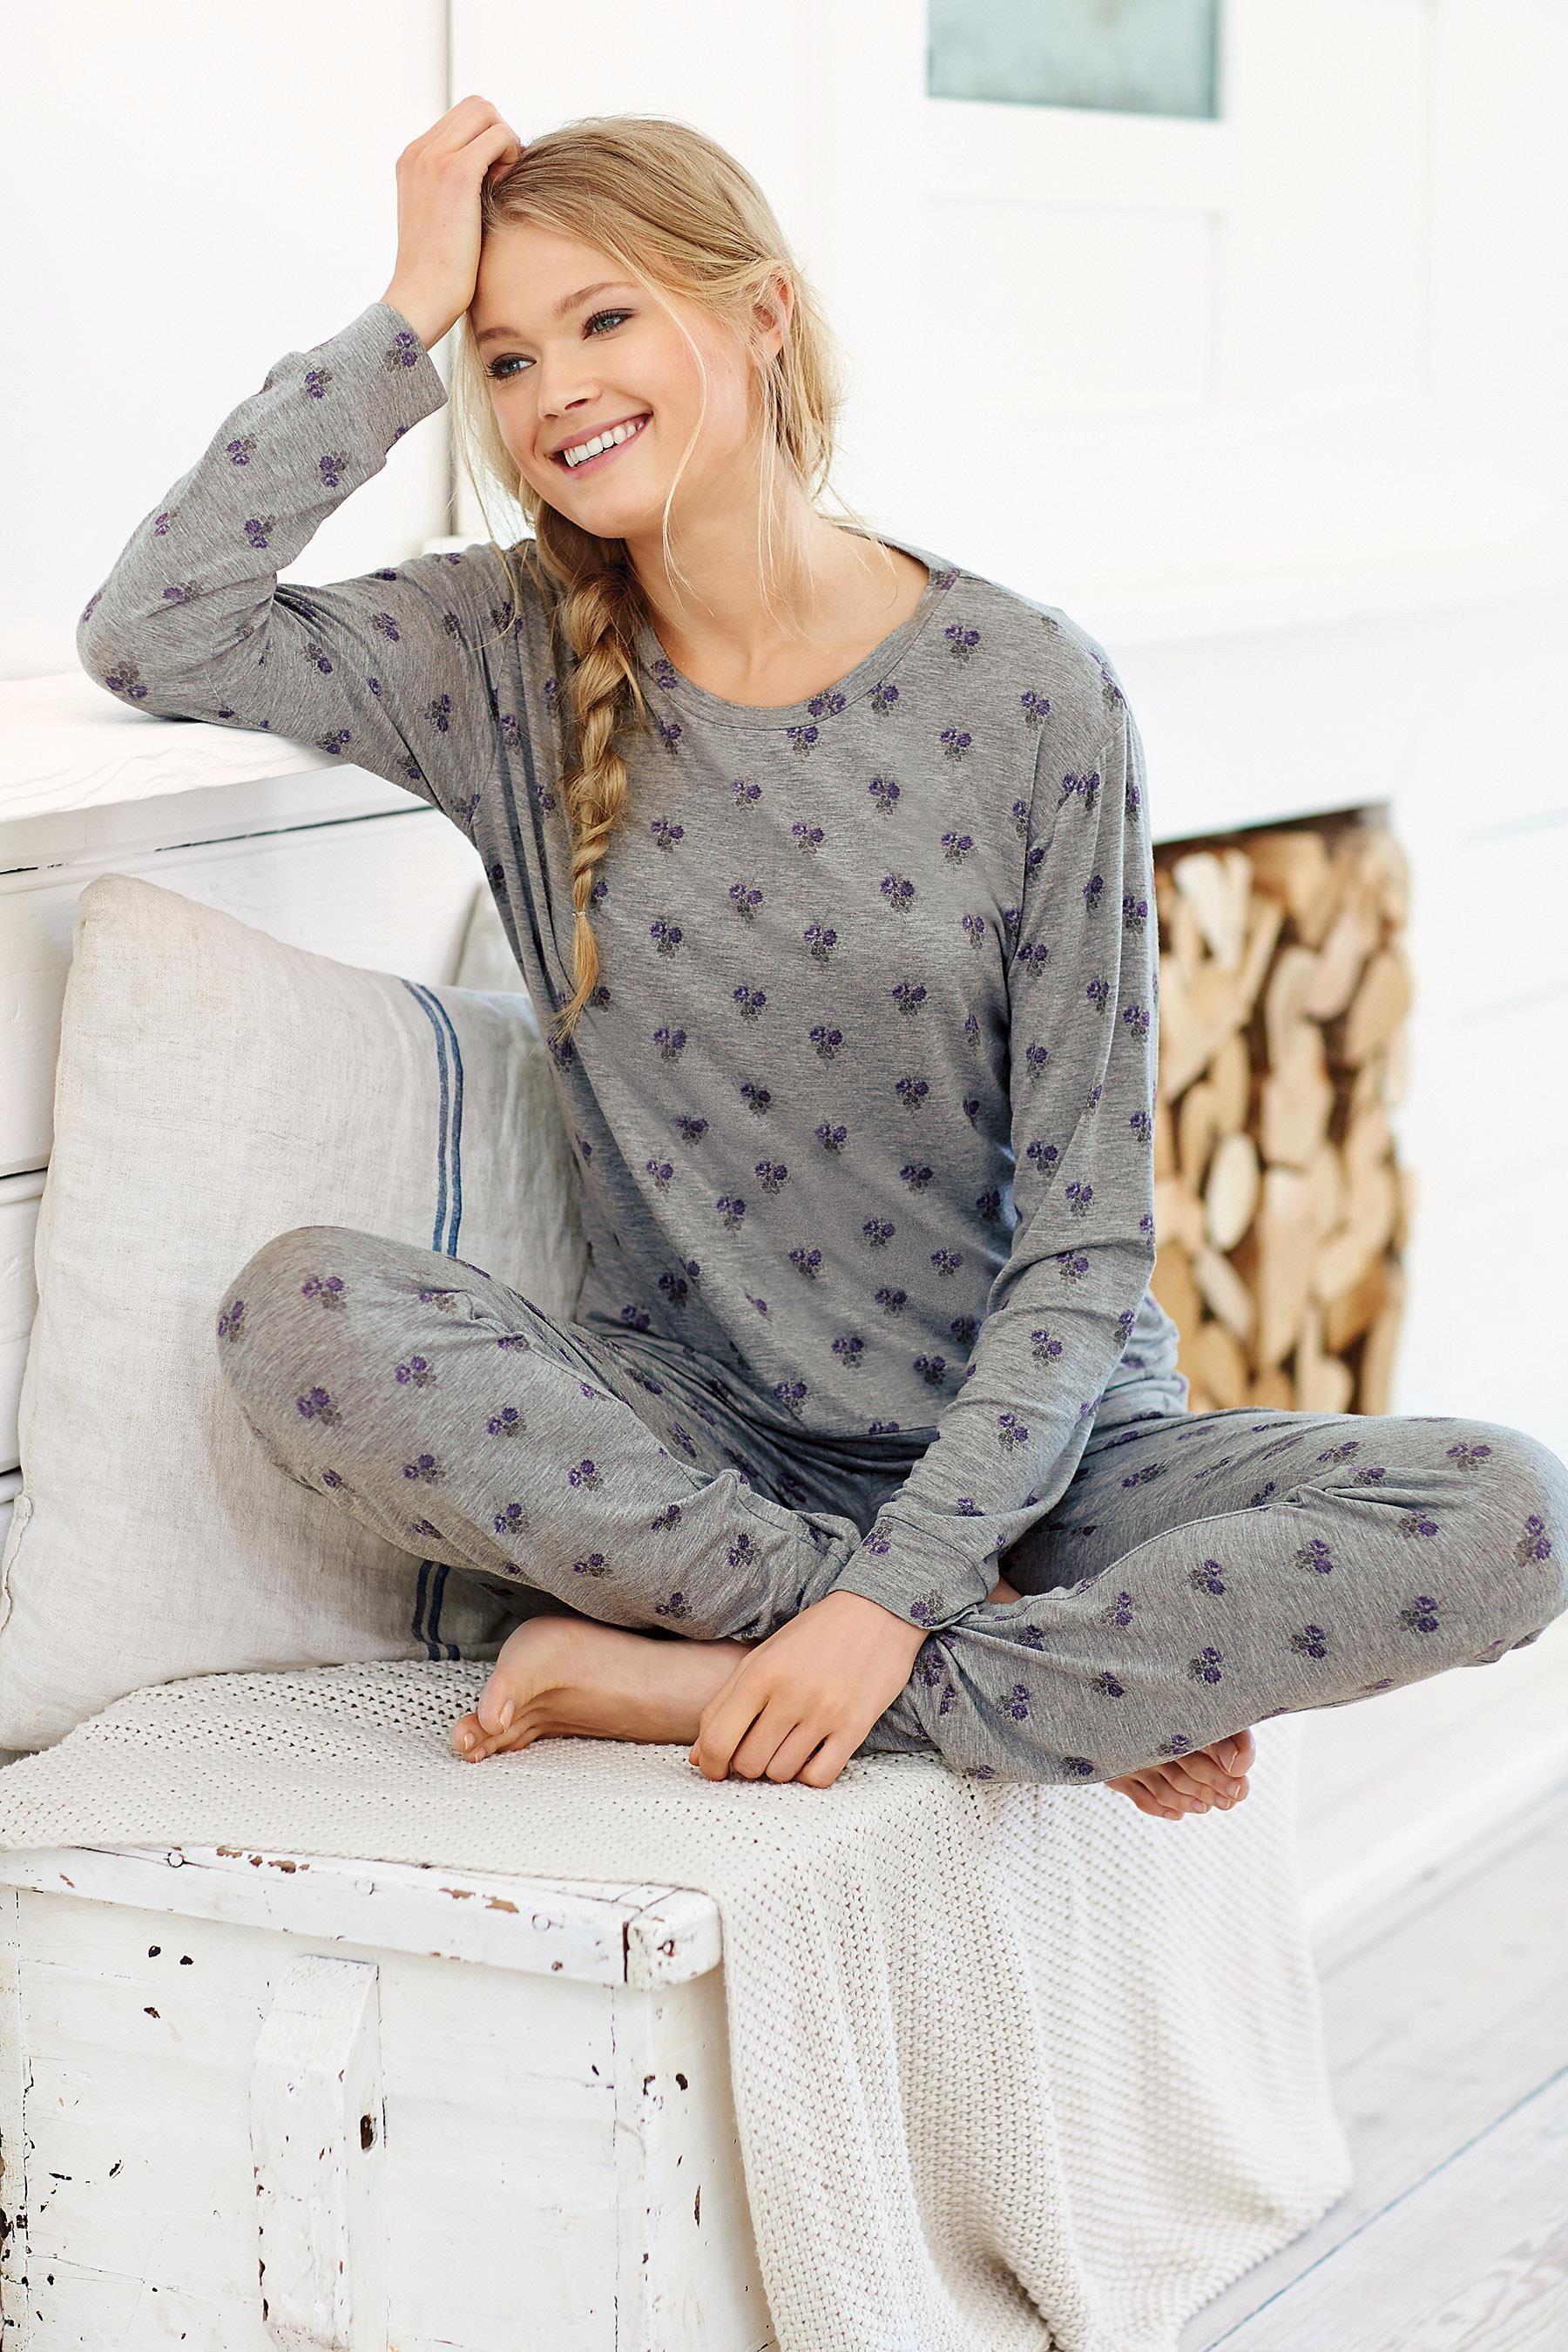 nextgrey star print wrapband pyjamas half off a53b2 9c276 ... 339c4b964